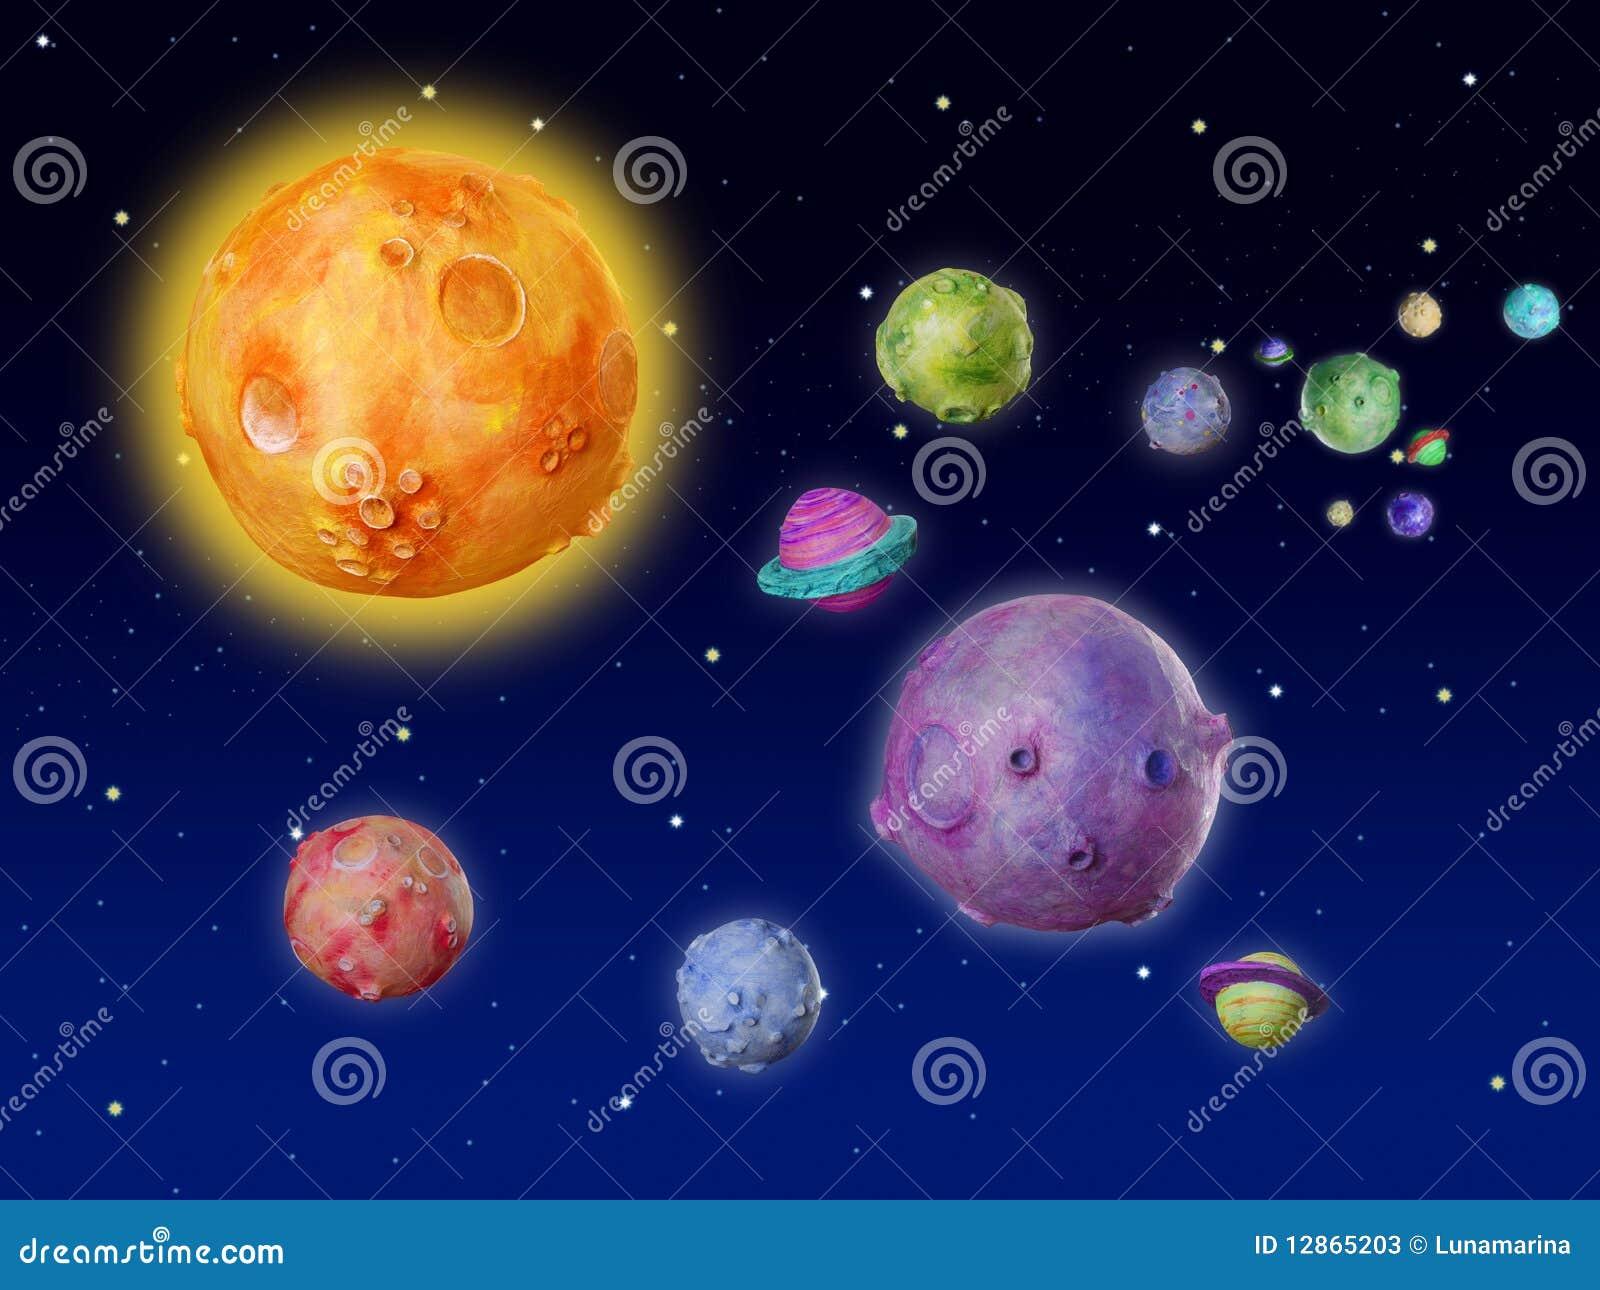 Univers Fabrique A La Main D Imagination De Planetes De L Espace